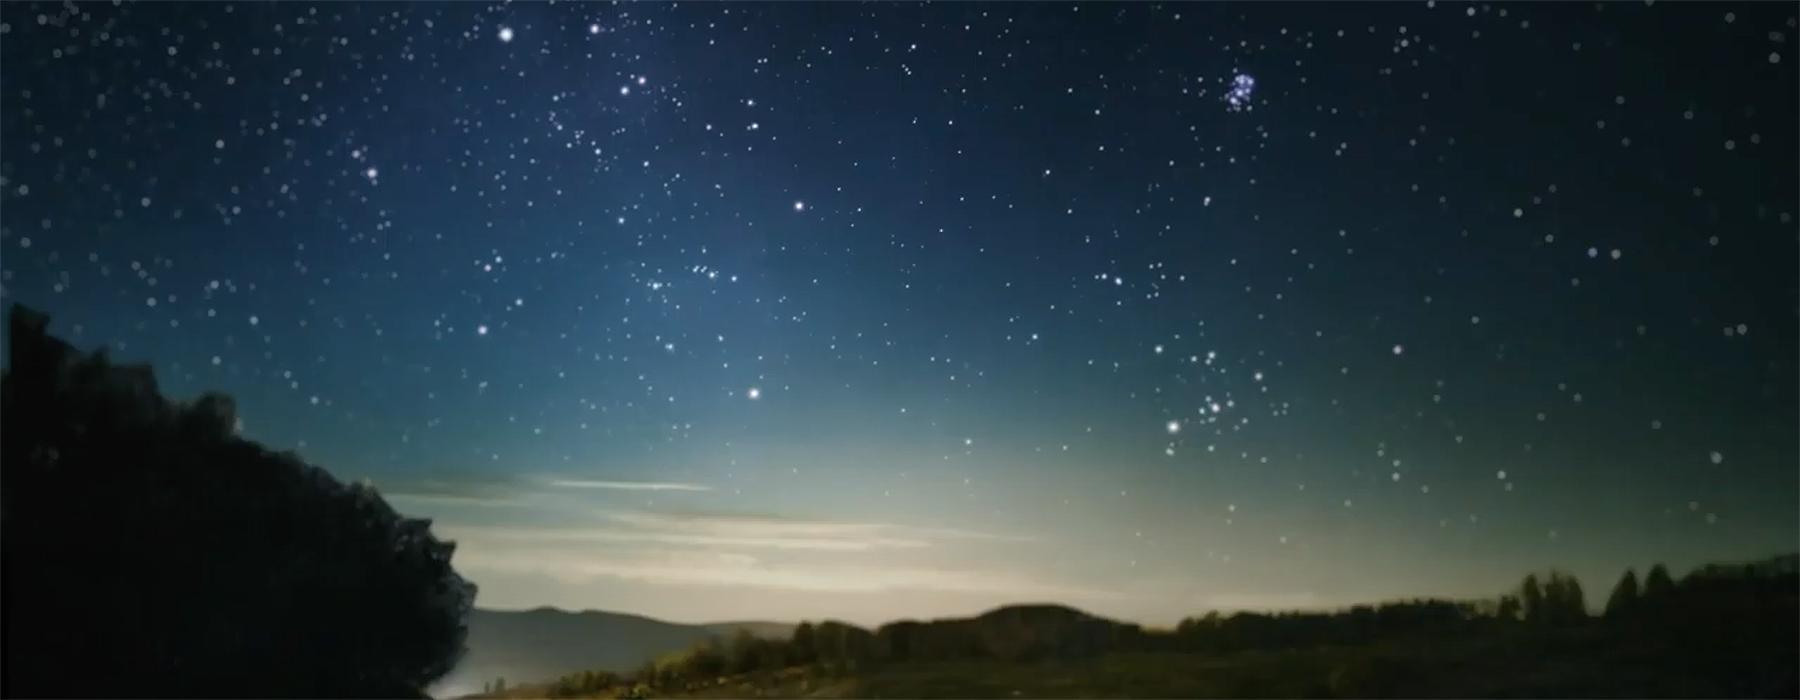 A starry sky over a darkened landscape